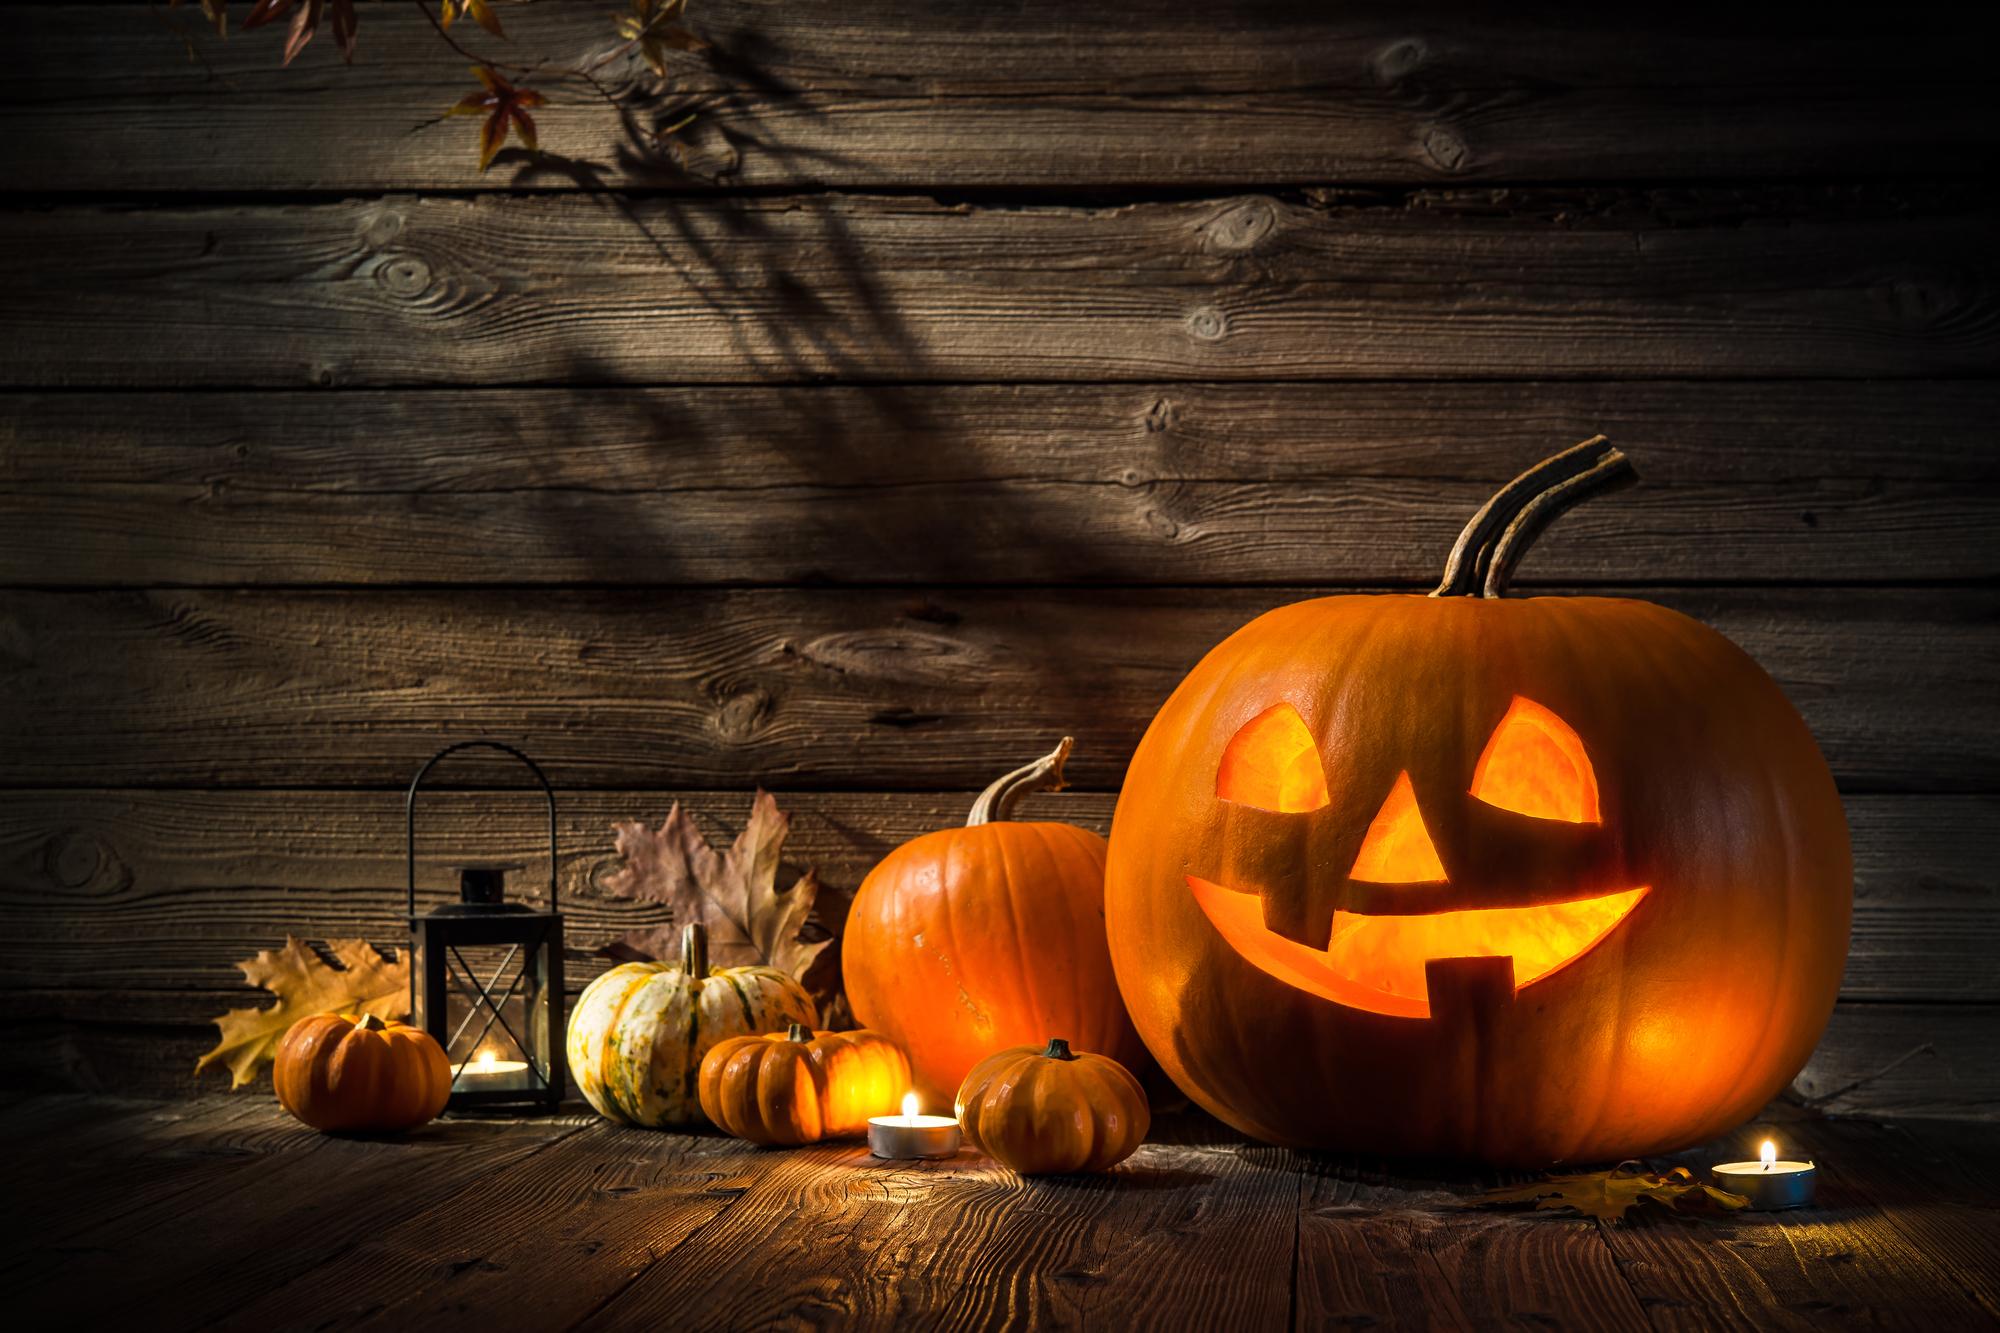 Хэллоуин 2019: история праздника